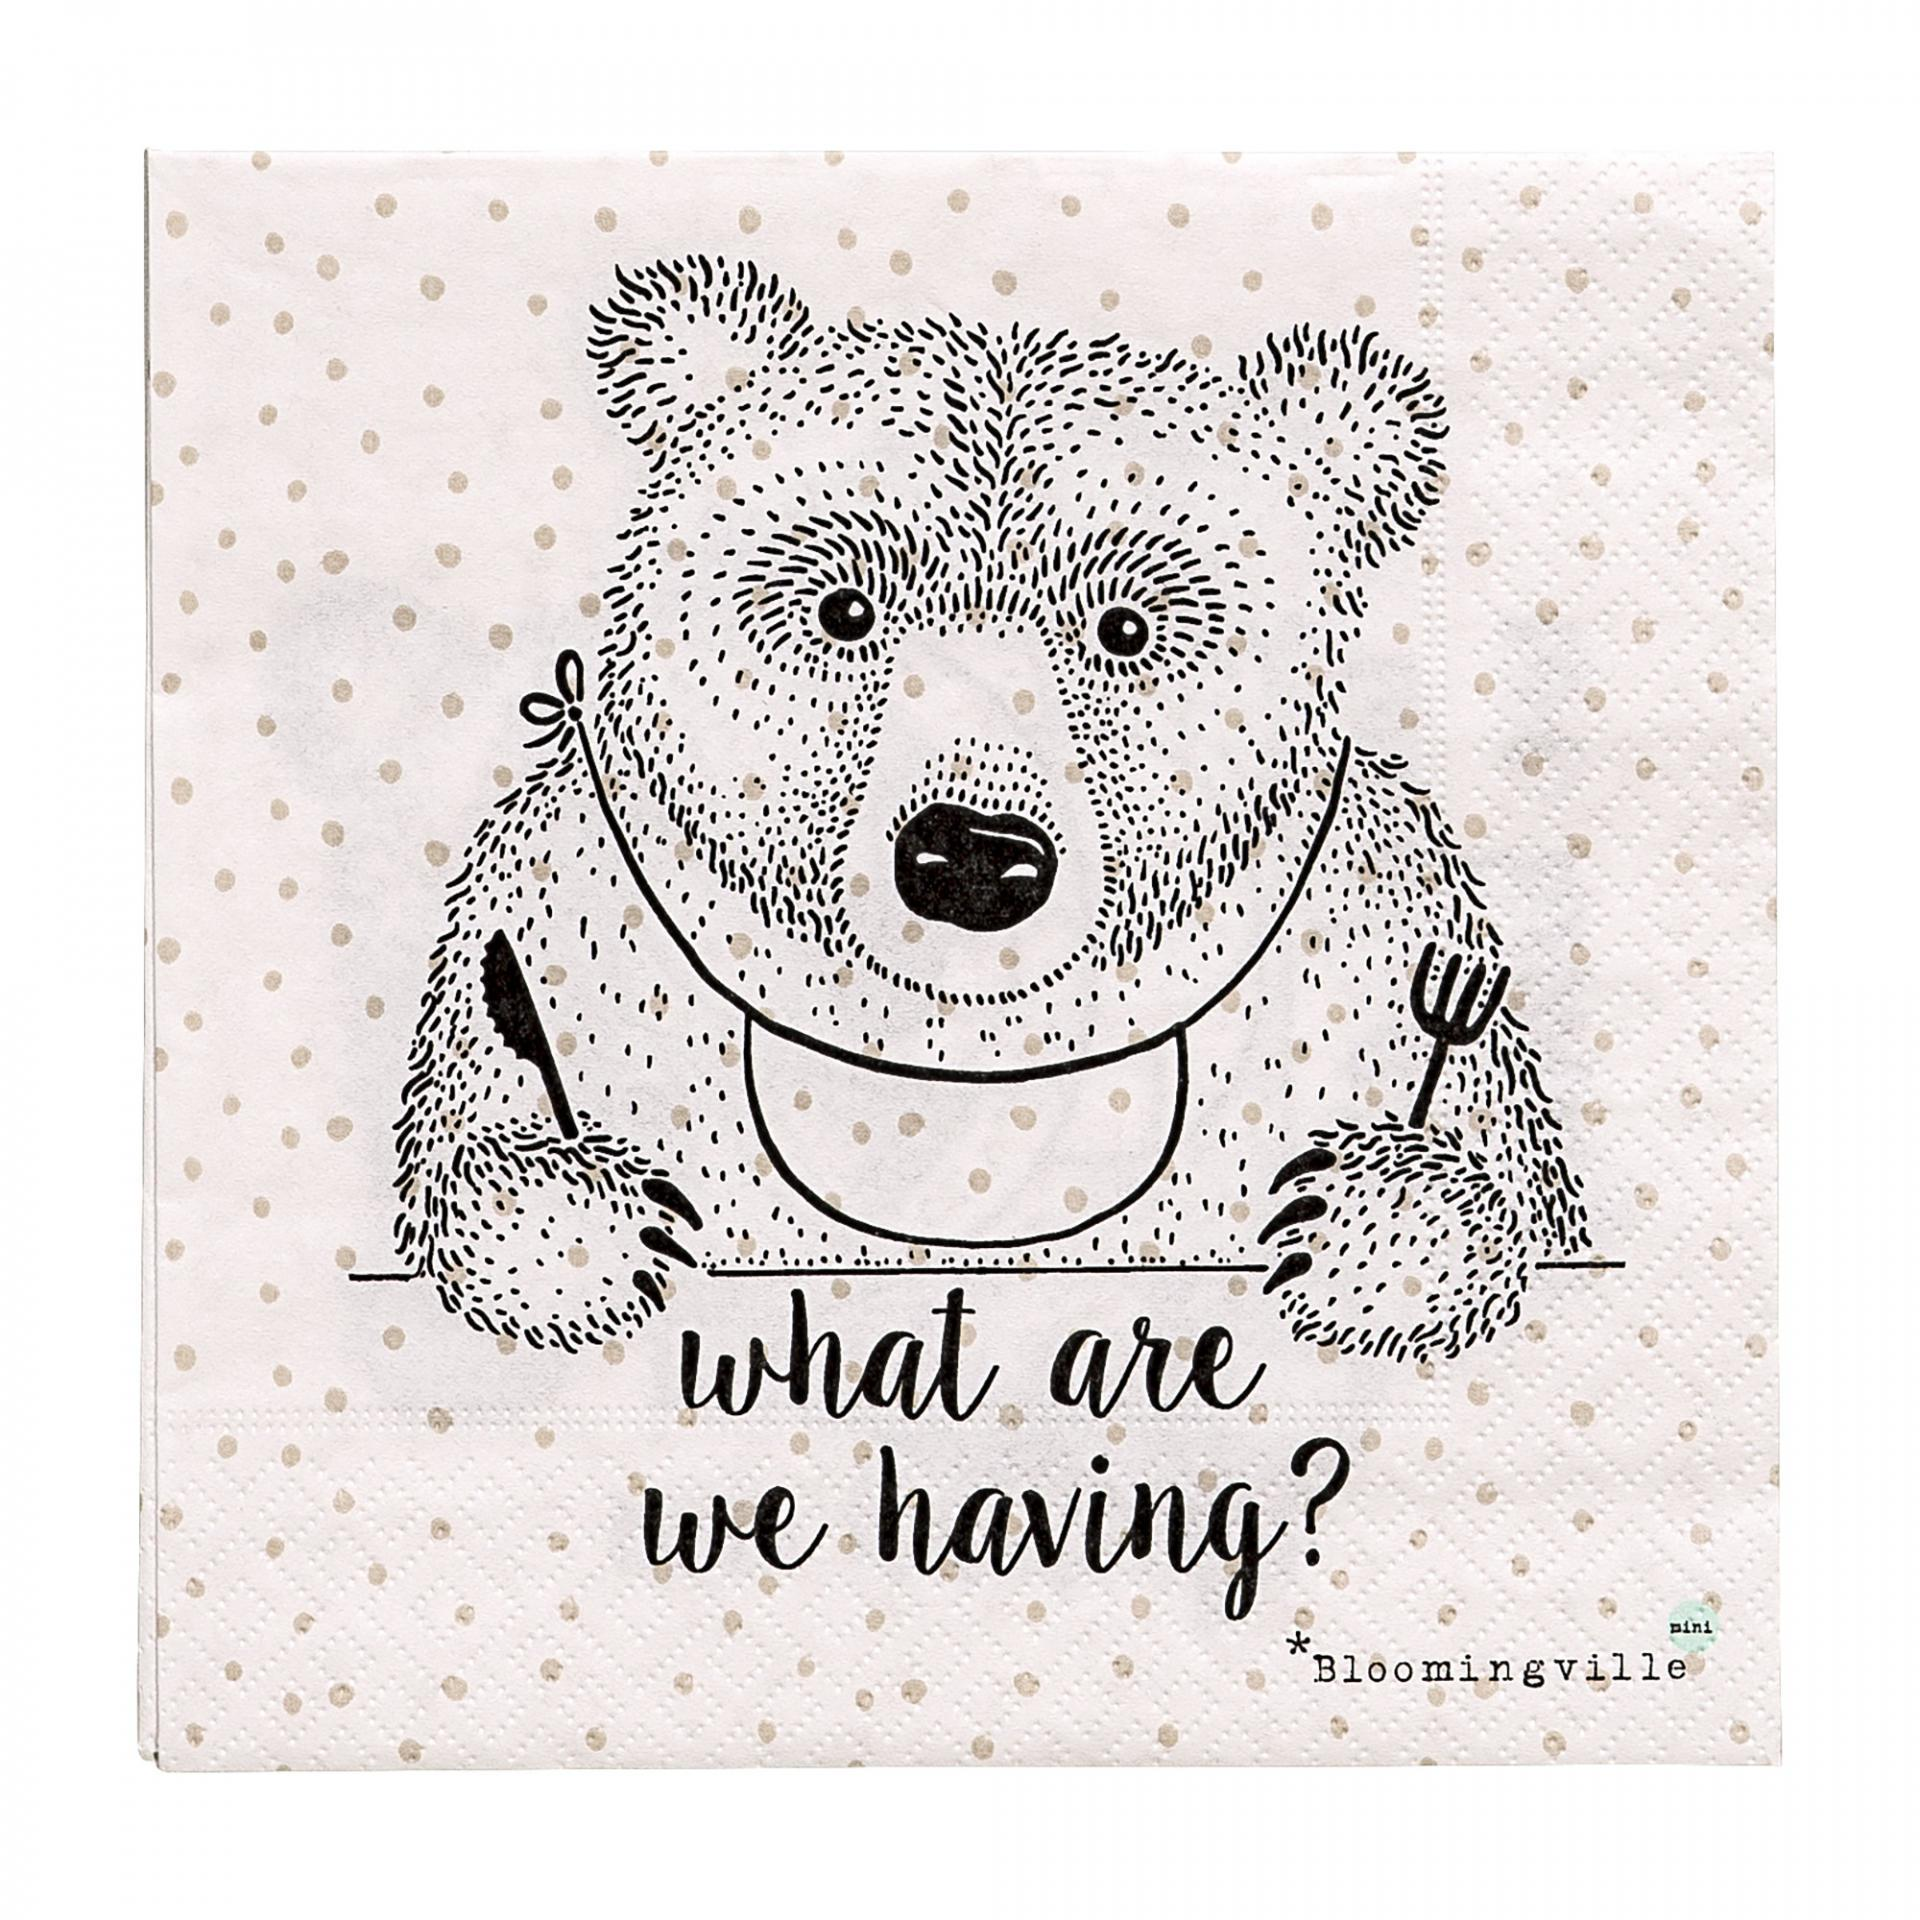 Bloomingville Papírové ubrousky Bear, černá barva, bílá barva, papír